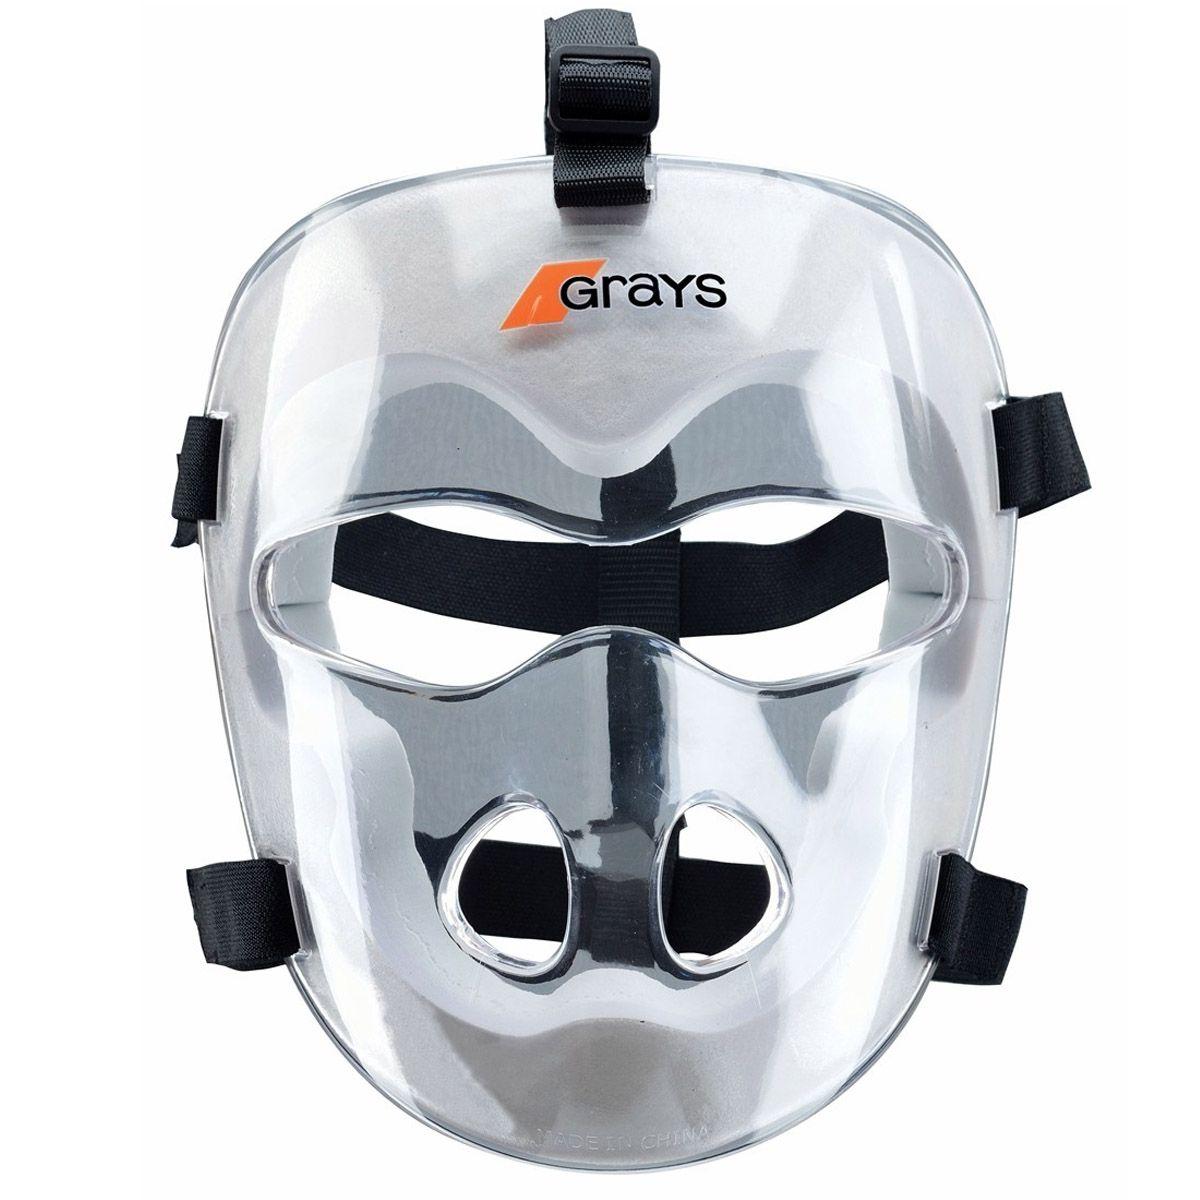 Grays Facemask Senior